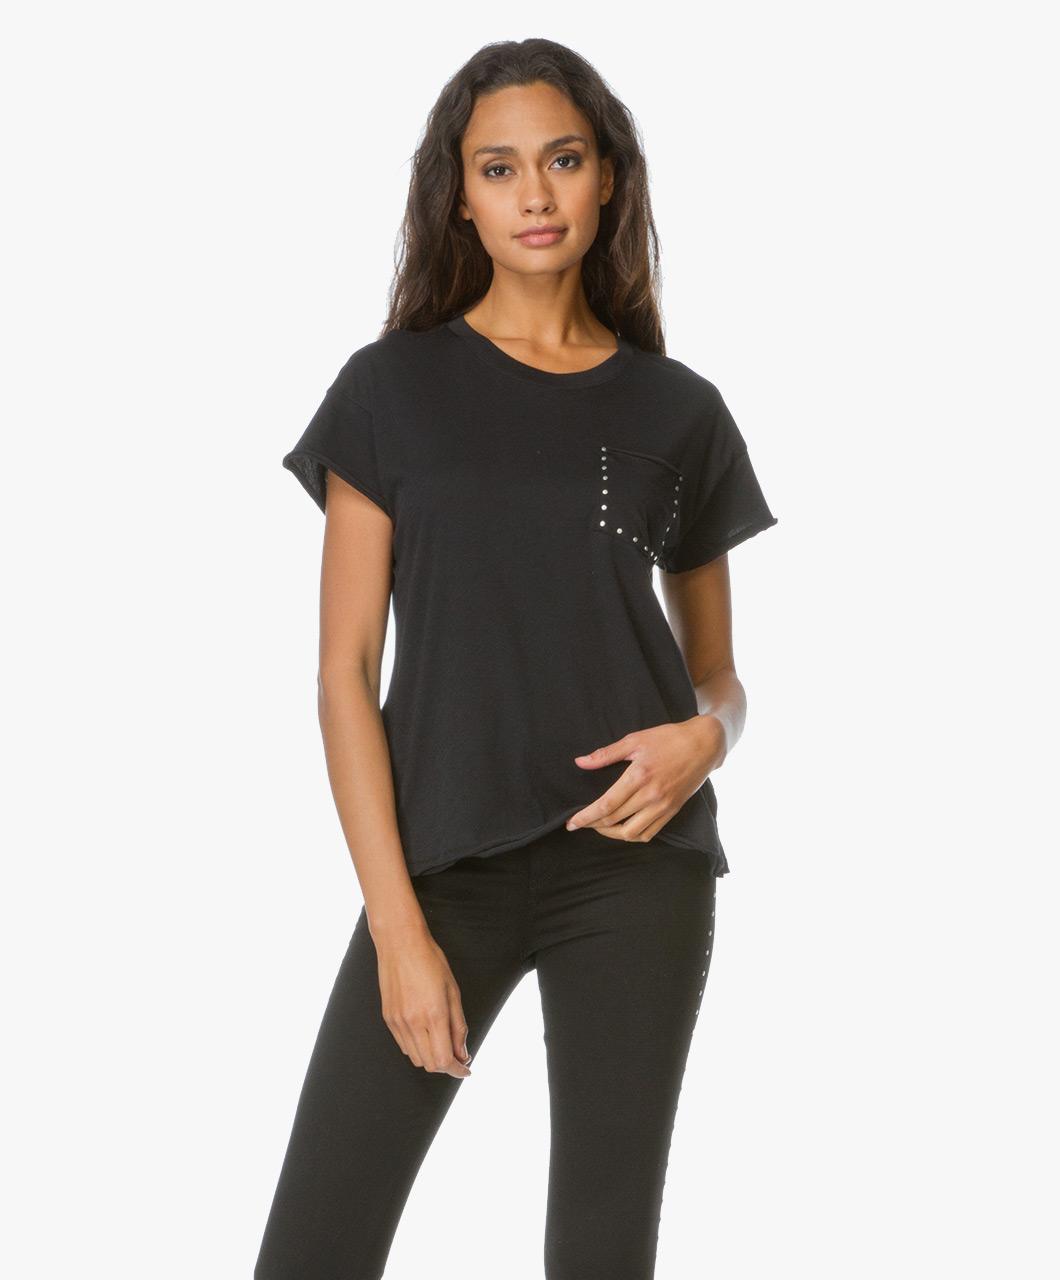 Rag bone jean vintage crew studs t shirt black for Rag and bone t shirts